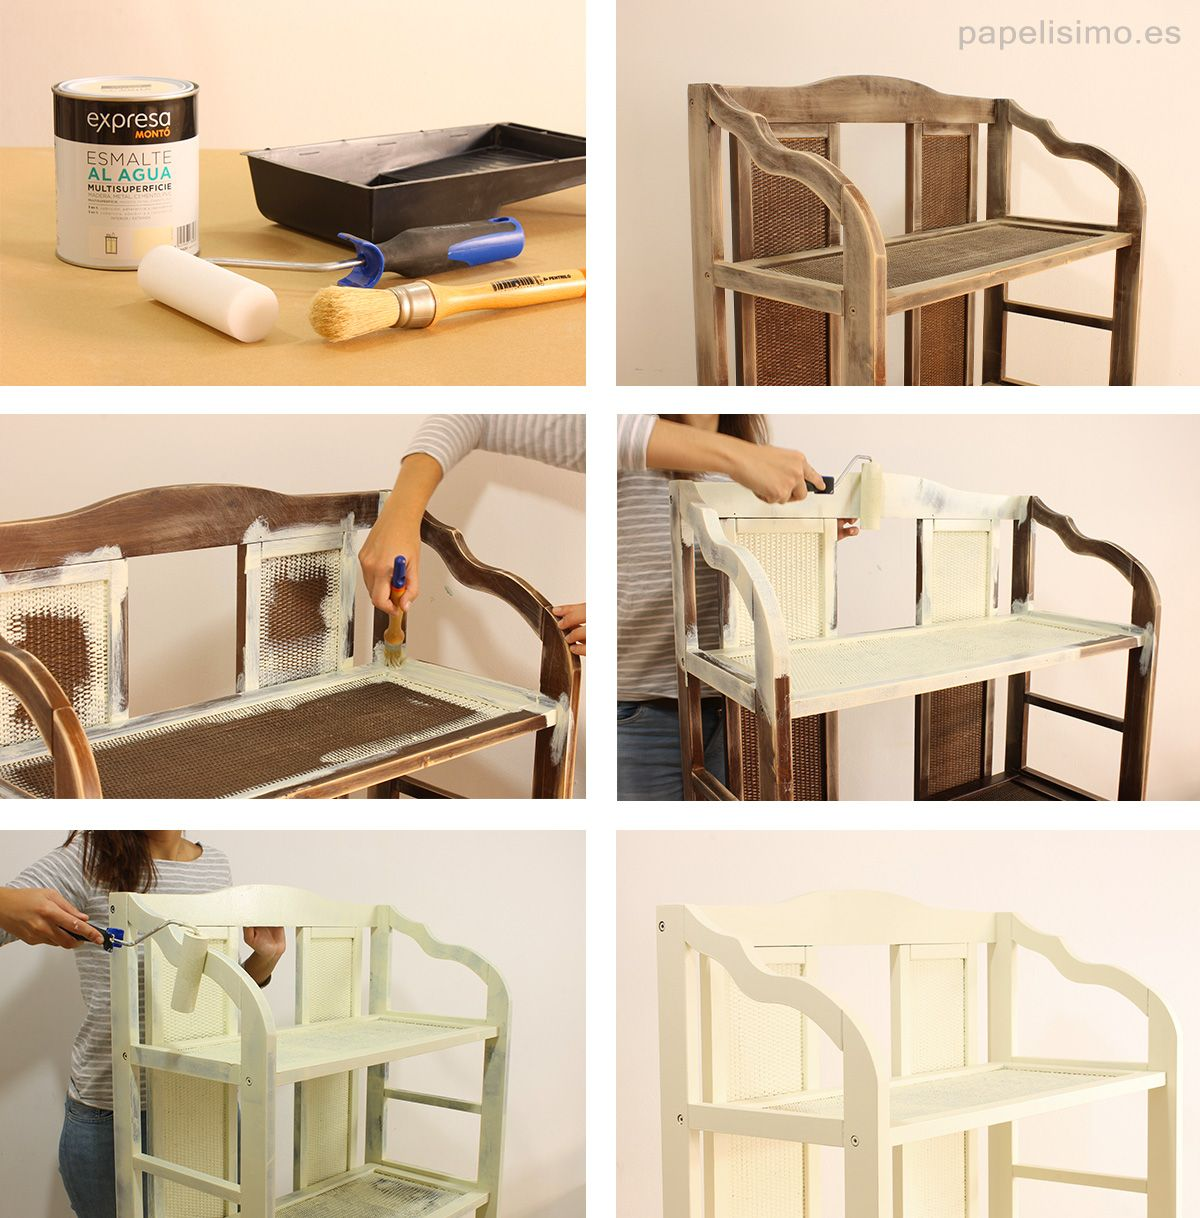 C mo pintar estanteria de madera blanco decoration - Pintar madera blanco ...